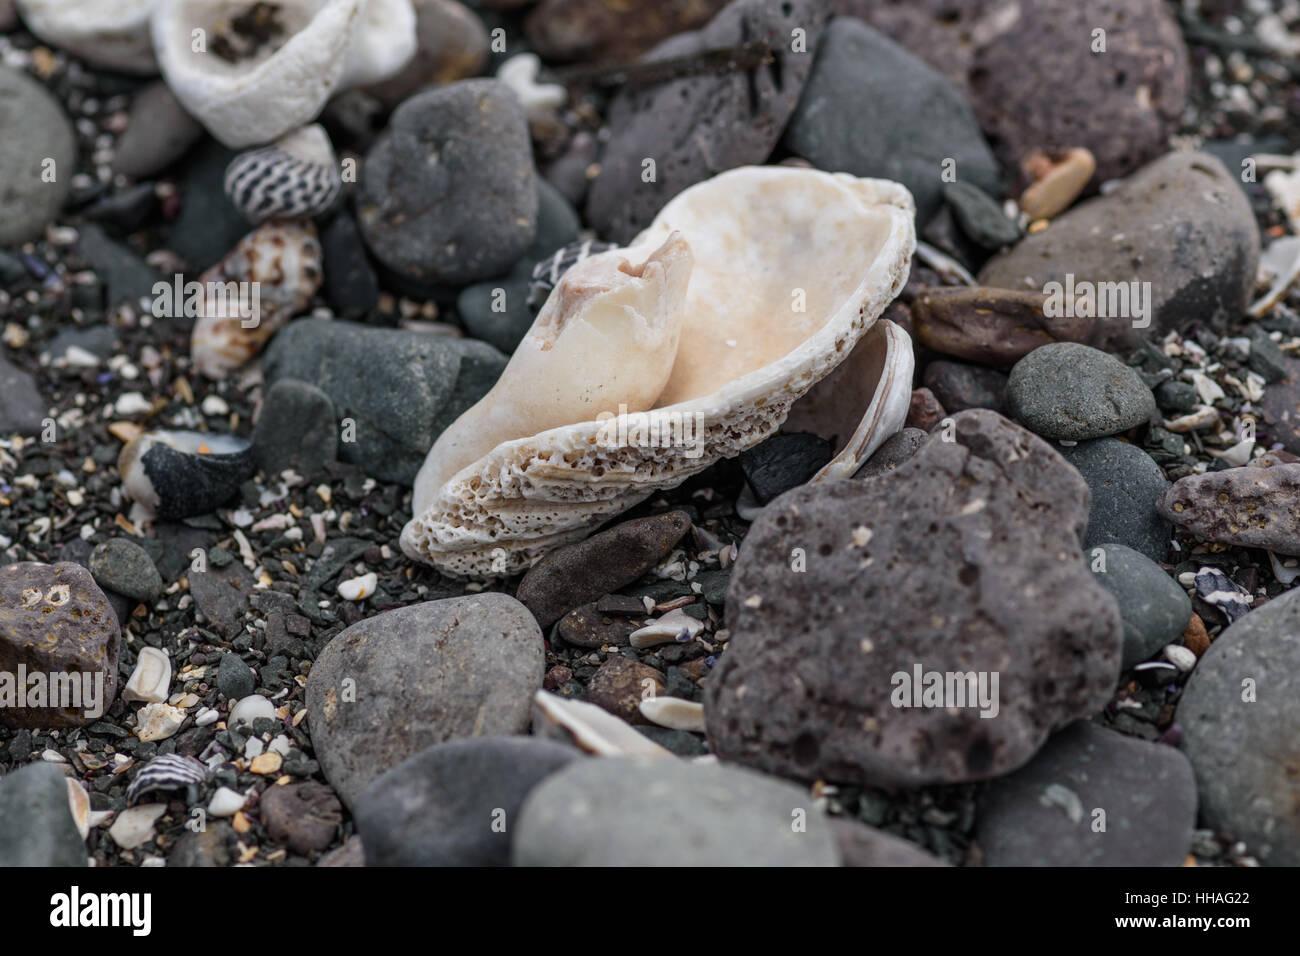 seashell polished by waves on a rocky beach Stock Photo